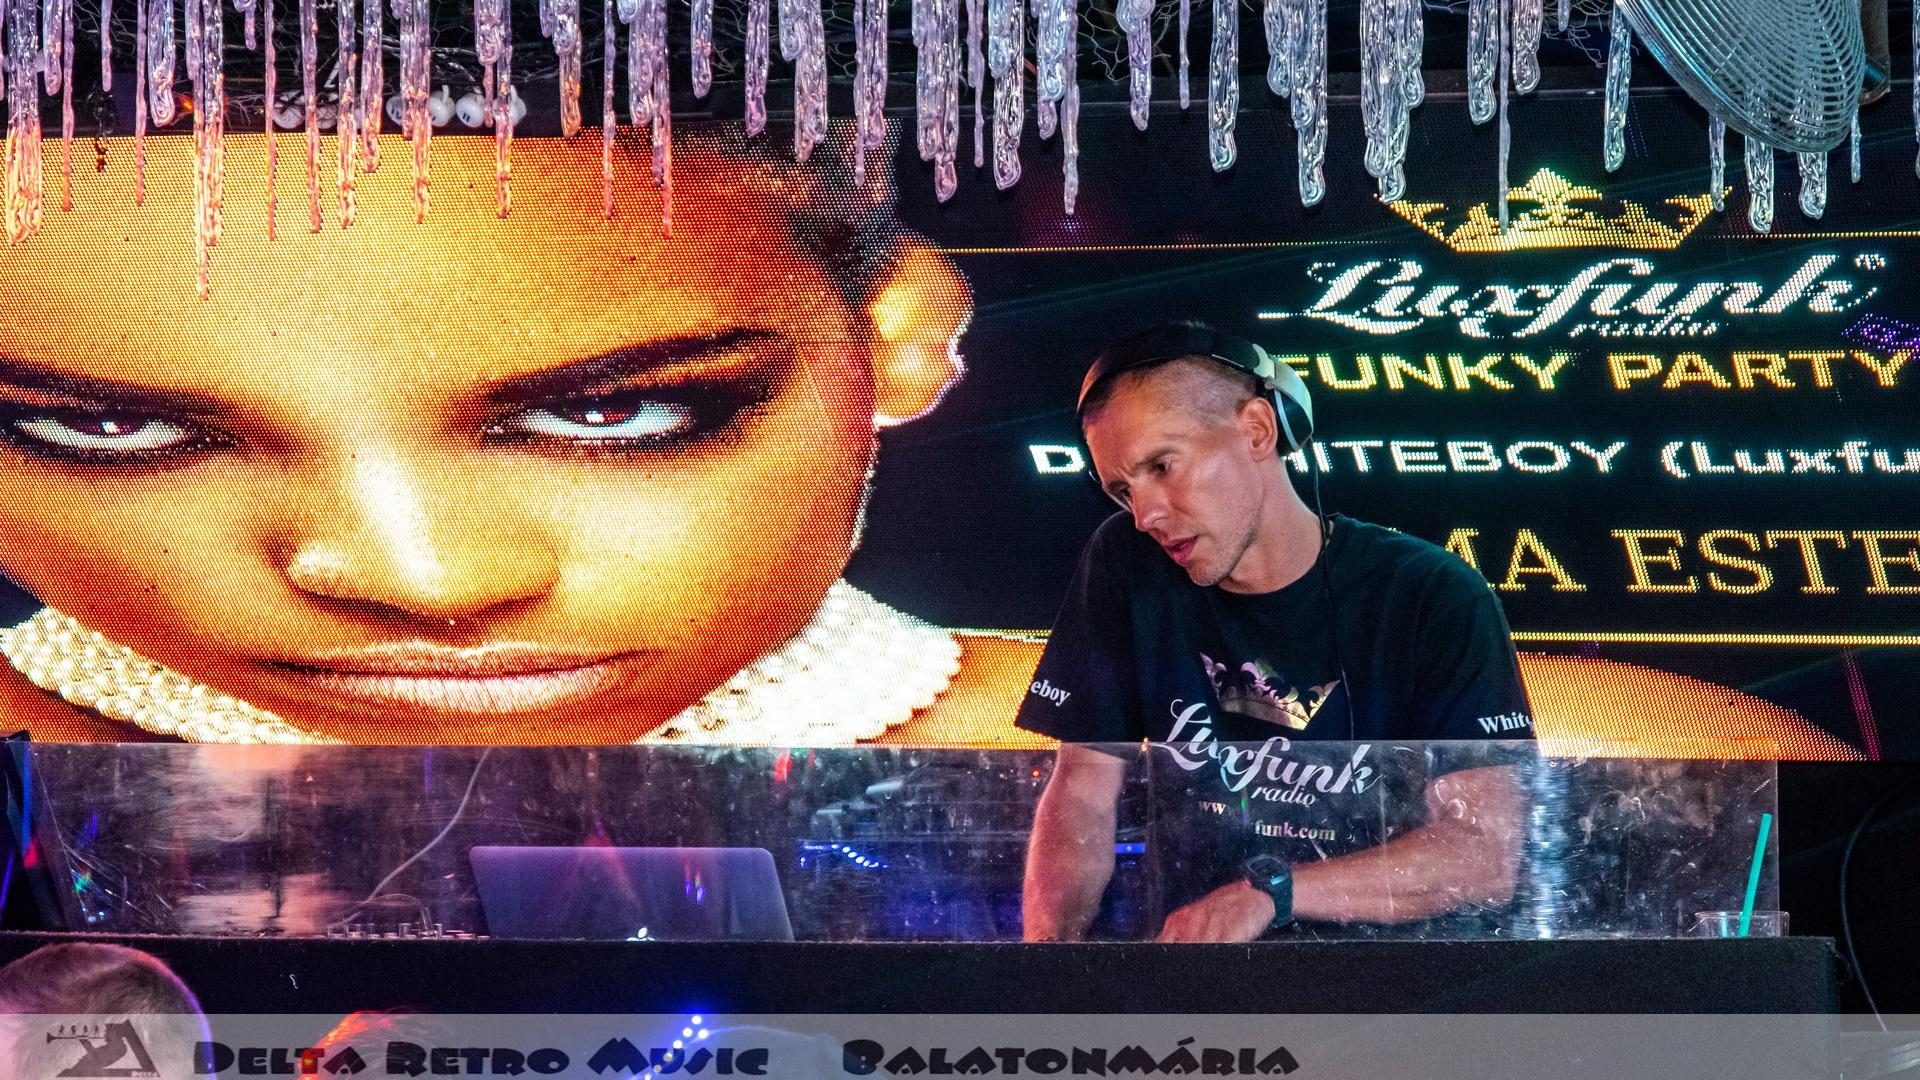 luxfunk-radio-funky-party_200807_delta retro-music-factory_008